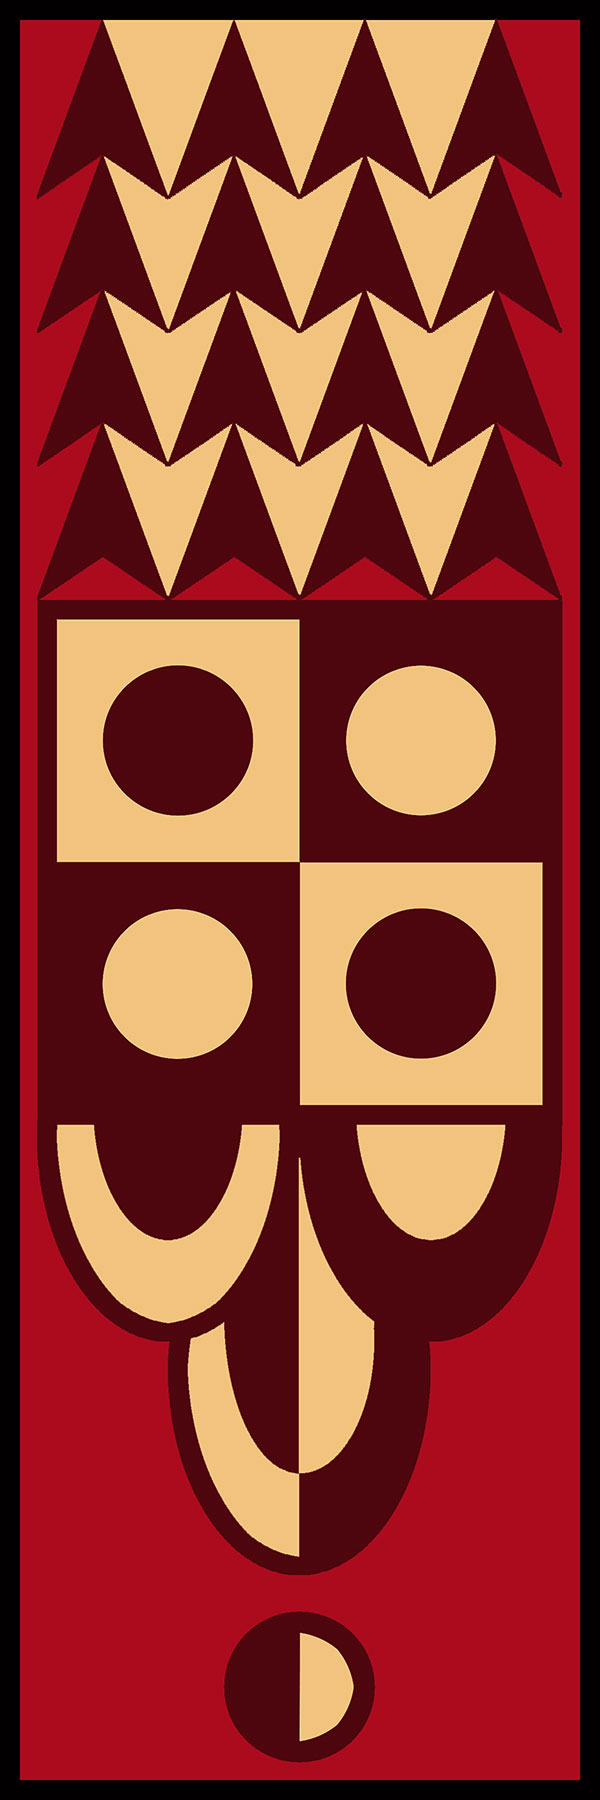 logo-redbg.jpg